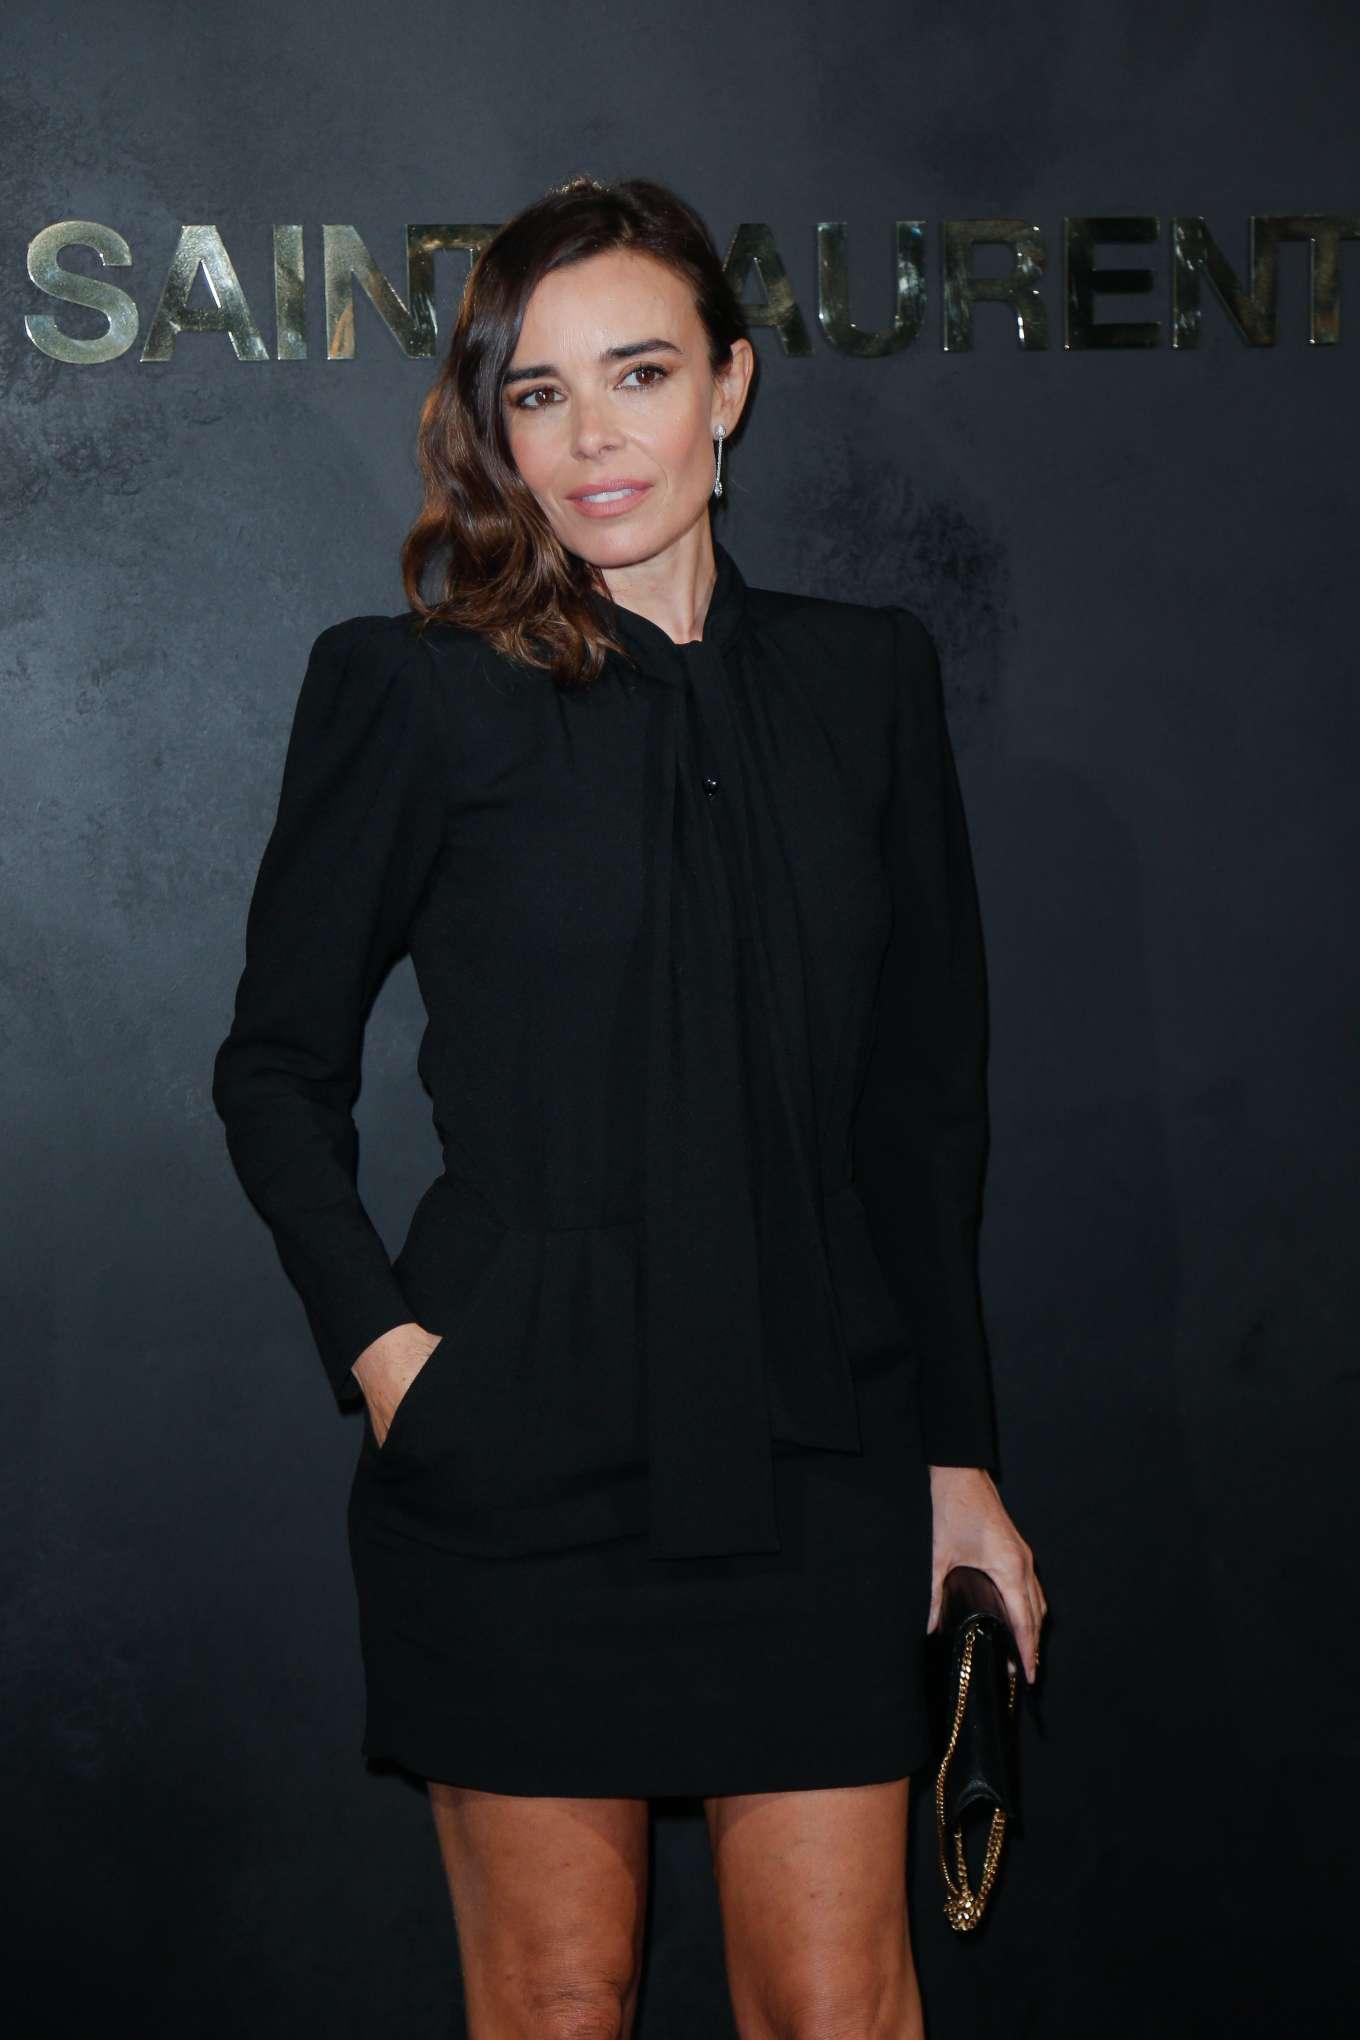 Elodie Bouchez 2019 : Elodie Bouchez – Saint Laurent Womenswear SS 2020 Show at Paris Fashion Week-01